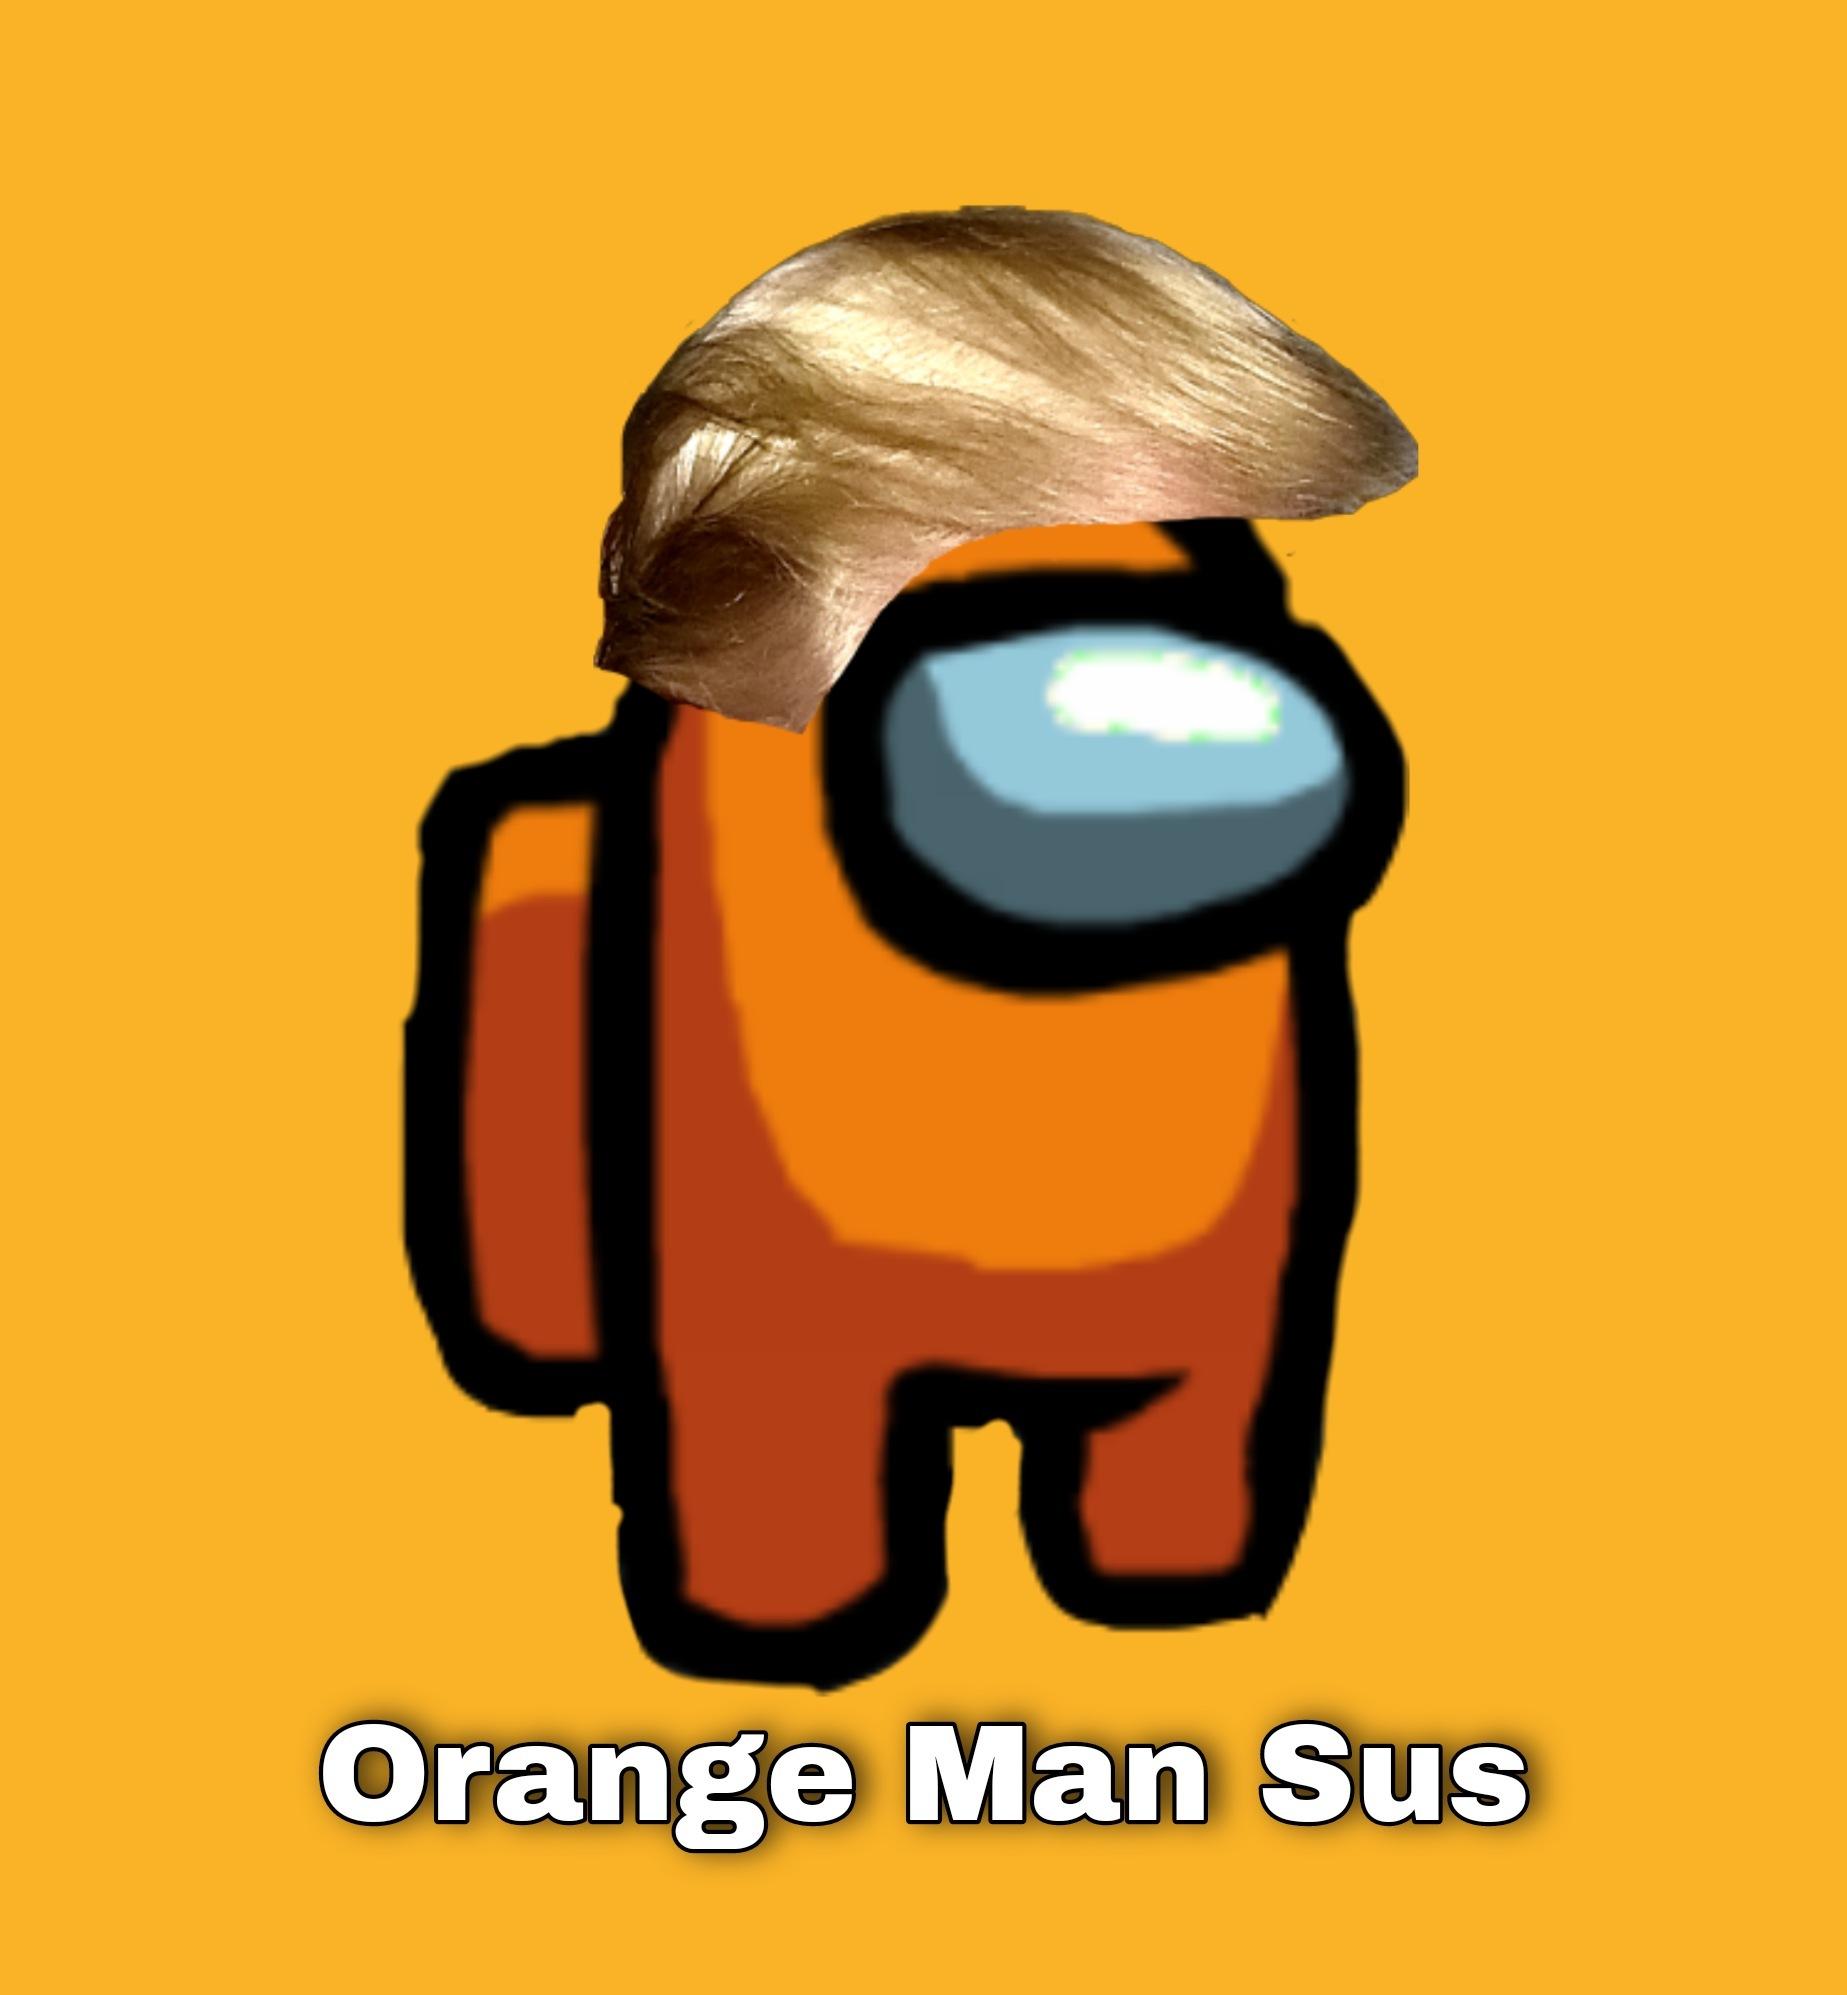 Among Us Orange Man Sus AOC Trump